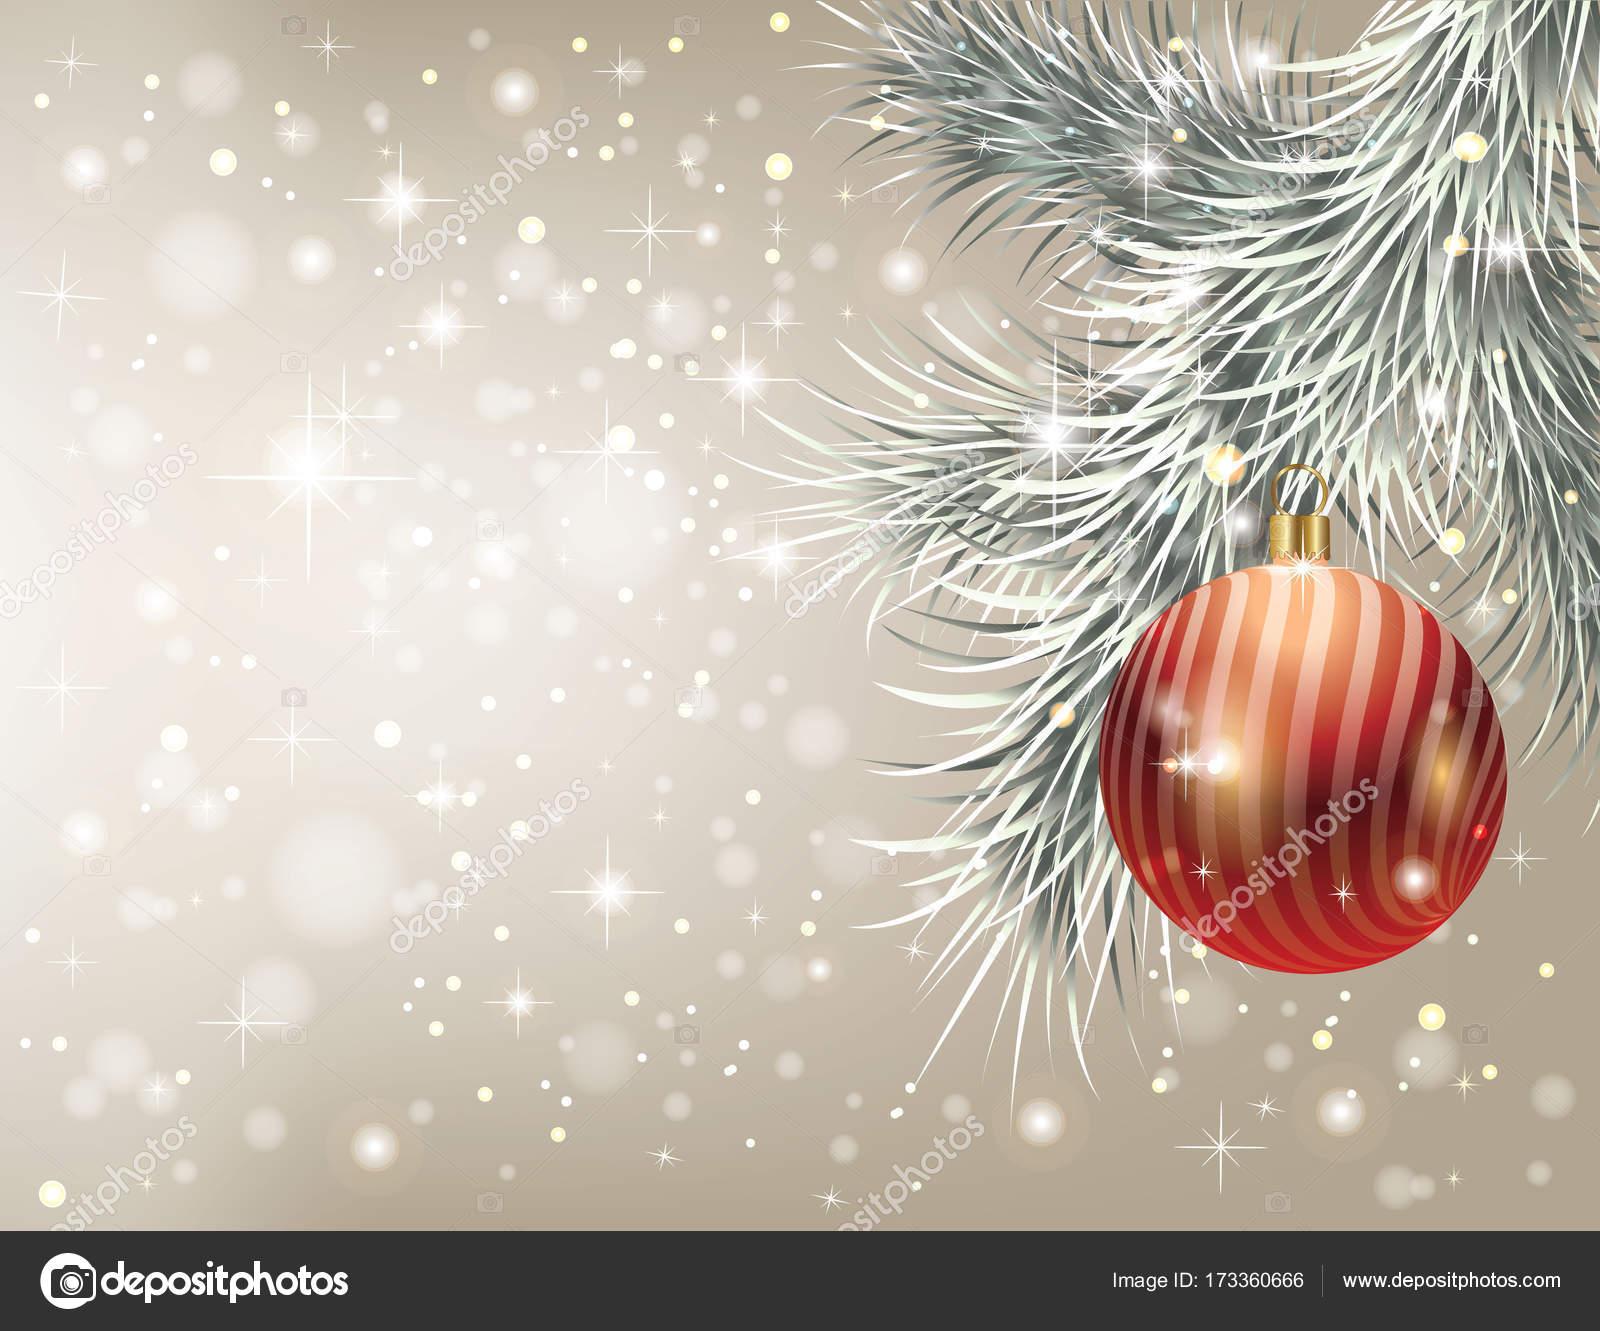 Elegant Christmas Background With Snowflakes Stock Vector: Elegant Christmas Background With Red Christmas Toy